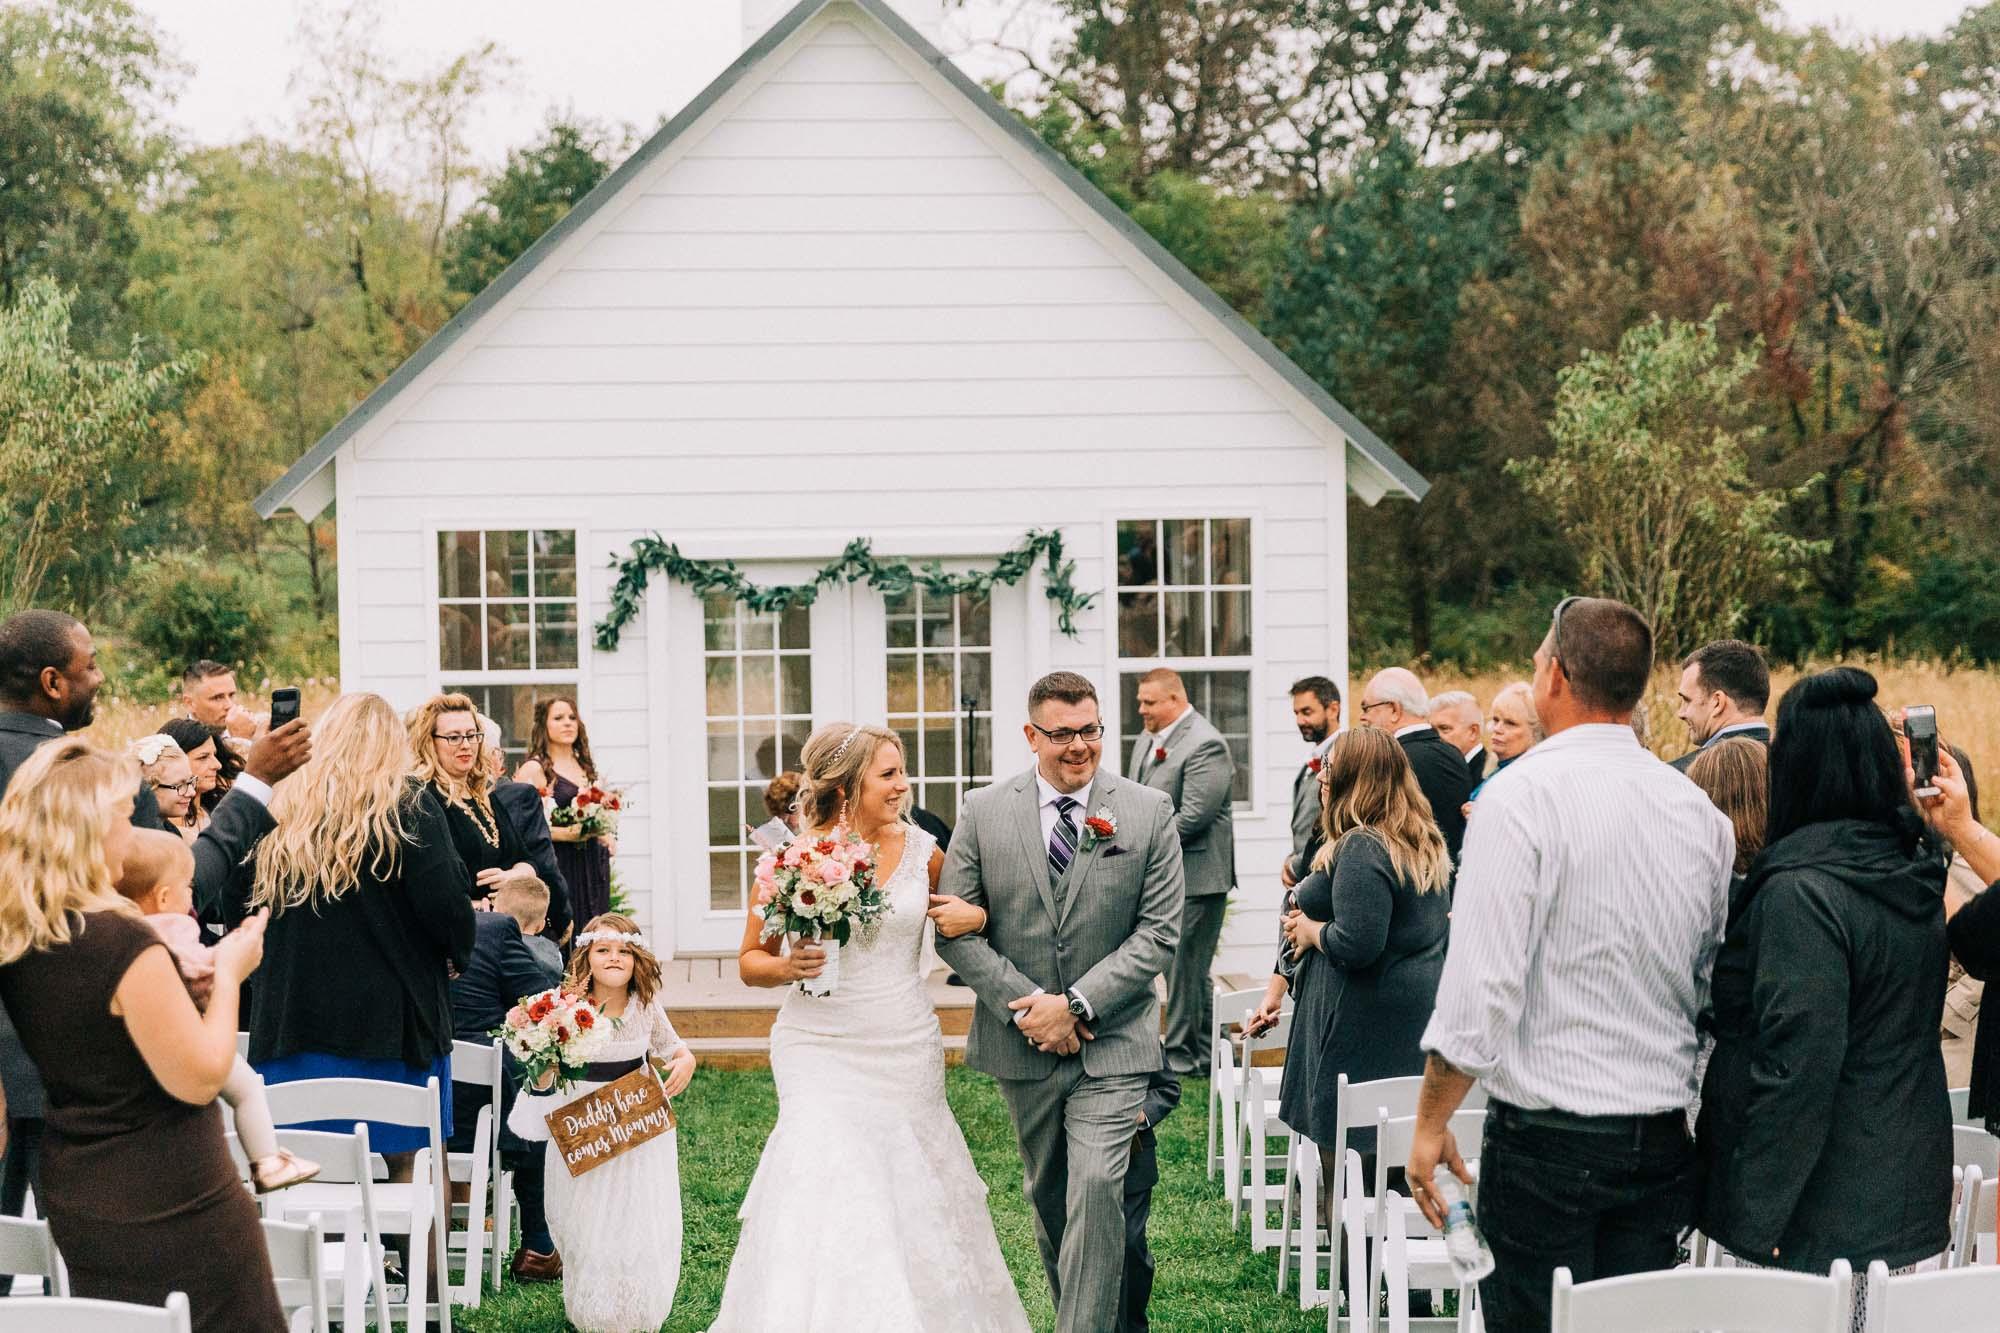 Lodge-at-Raven-Creek-October-wedding-36.jpg